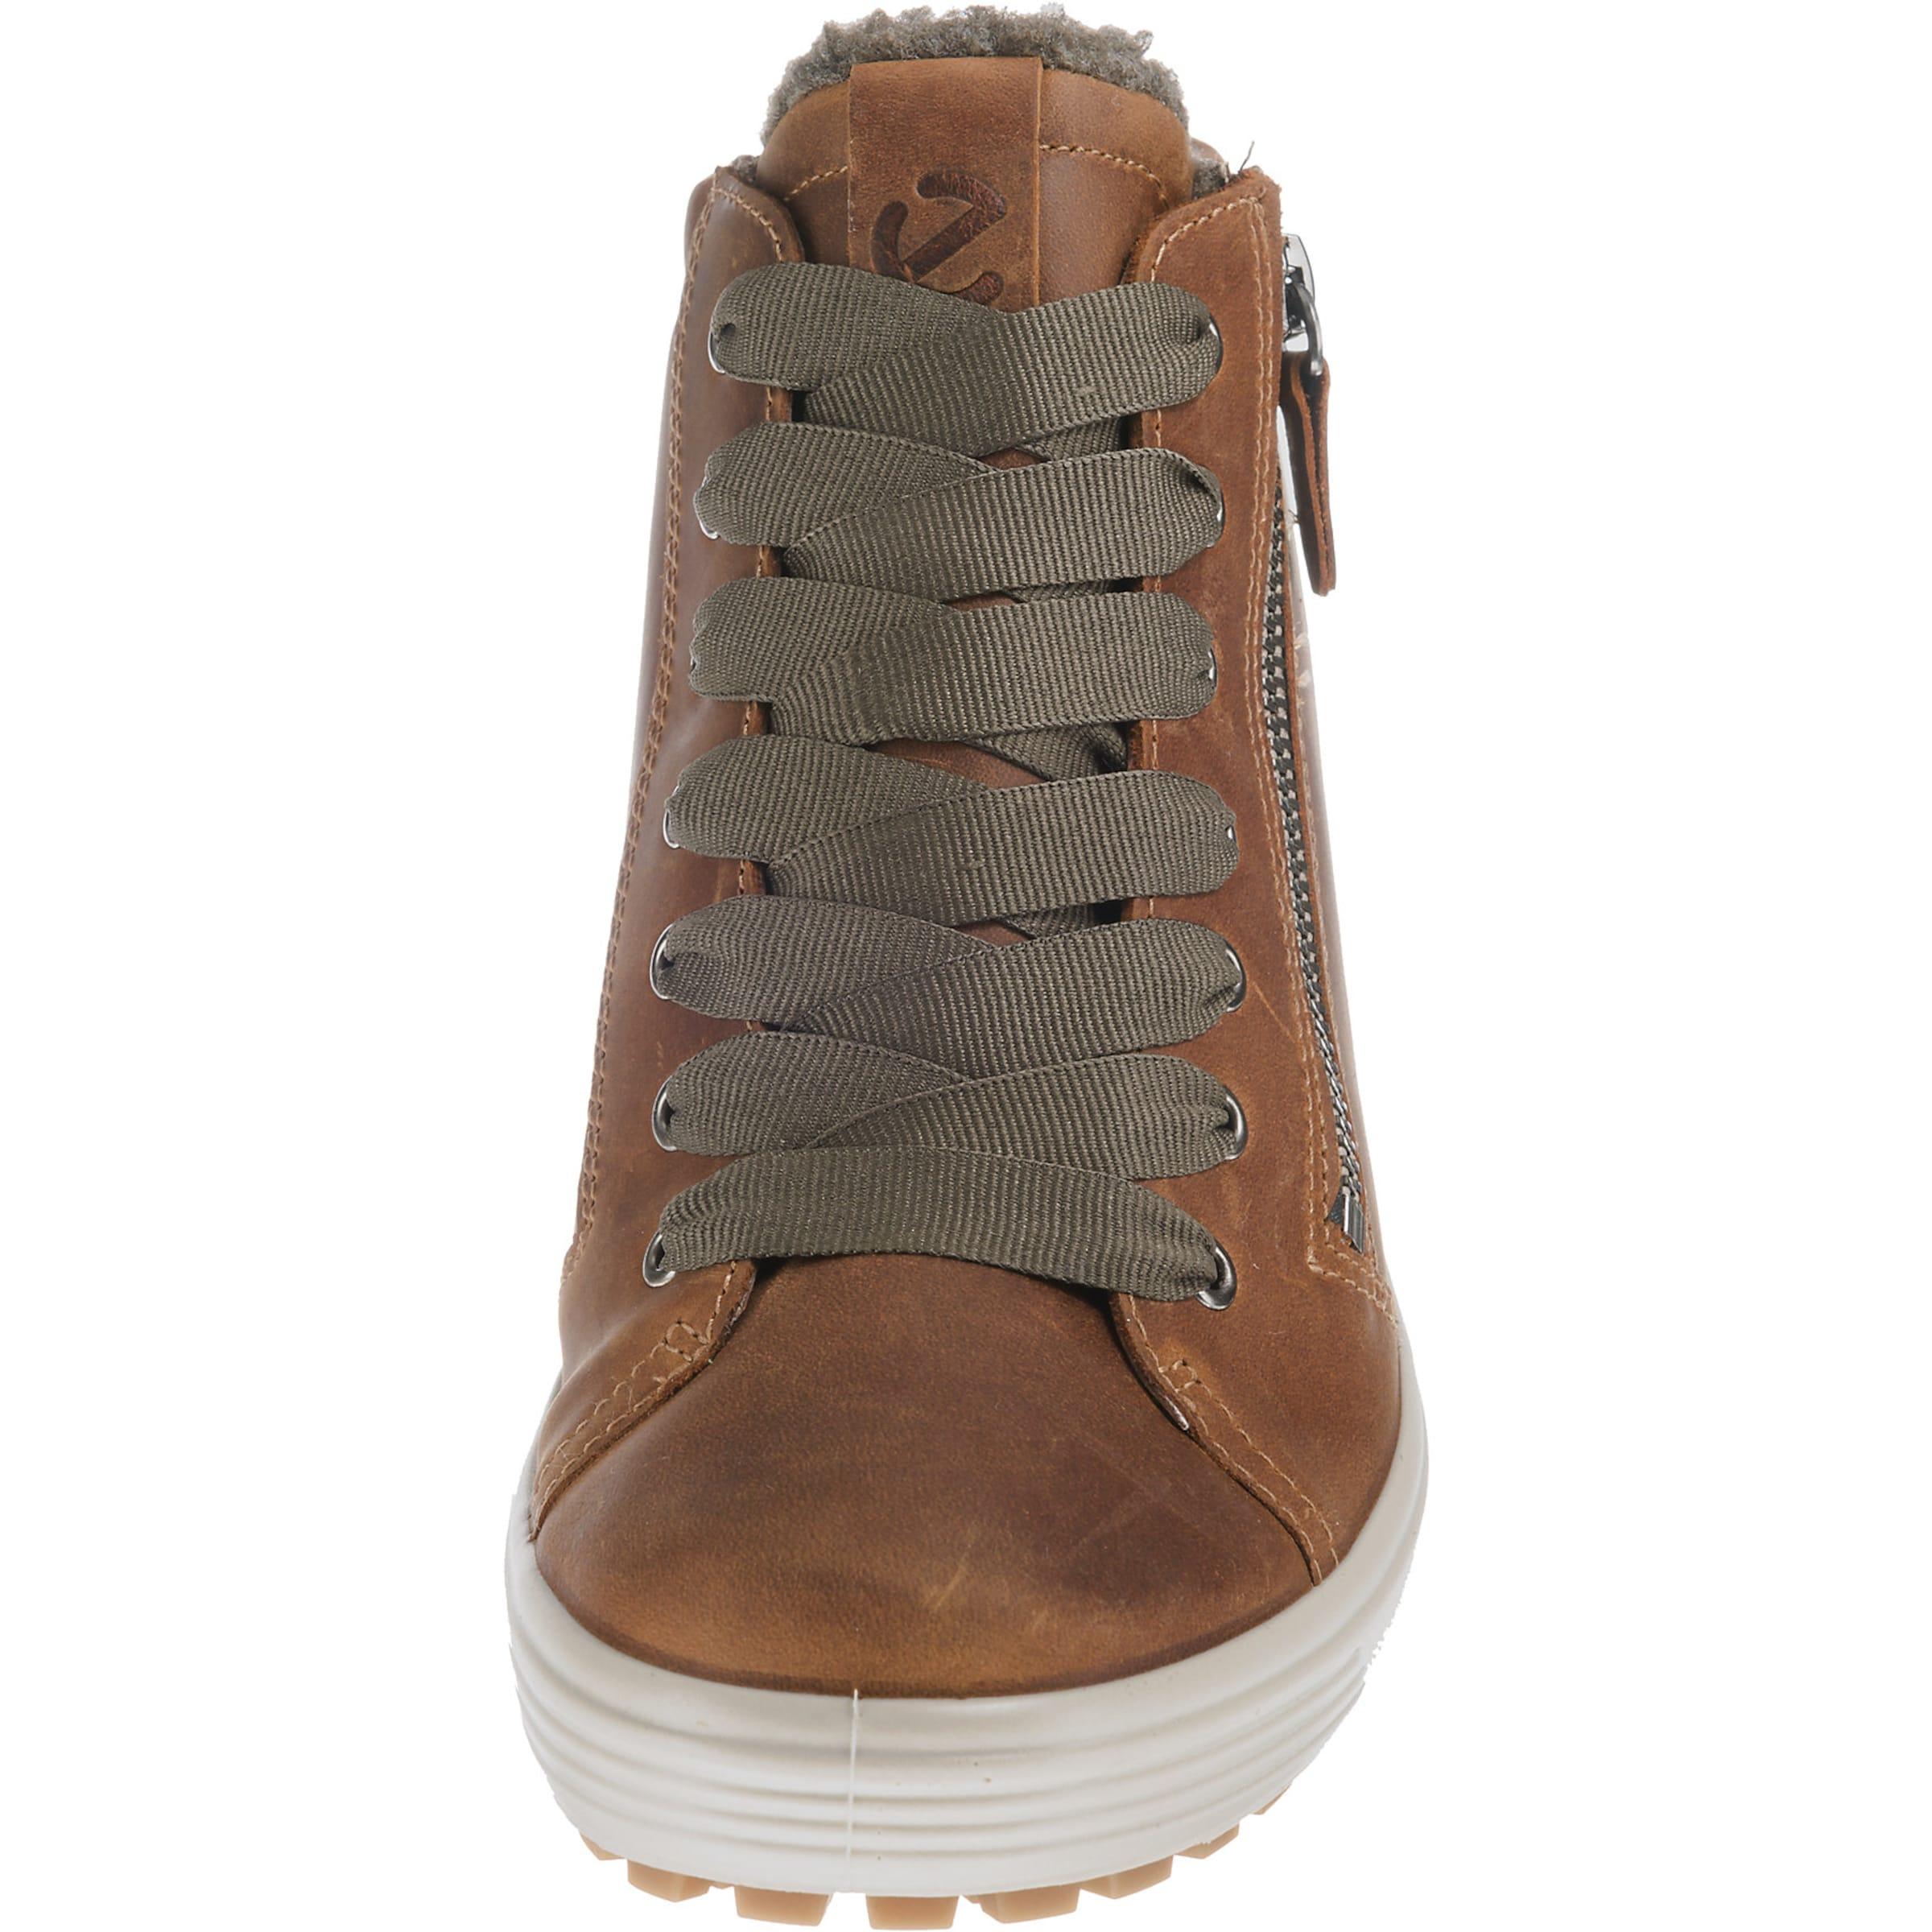 ECCO Sneakers hoog Soft 46 in Bruin Leer 254-30-00491_36